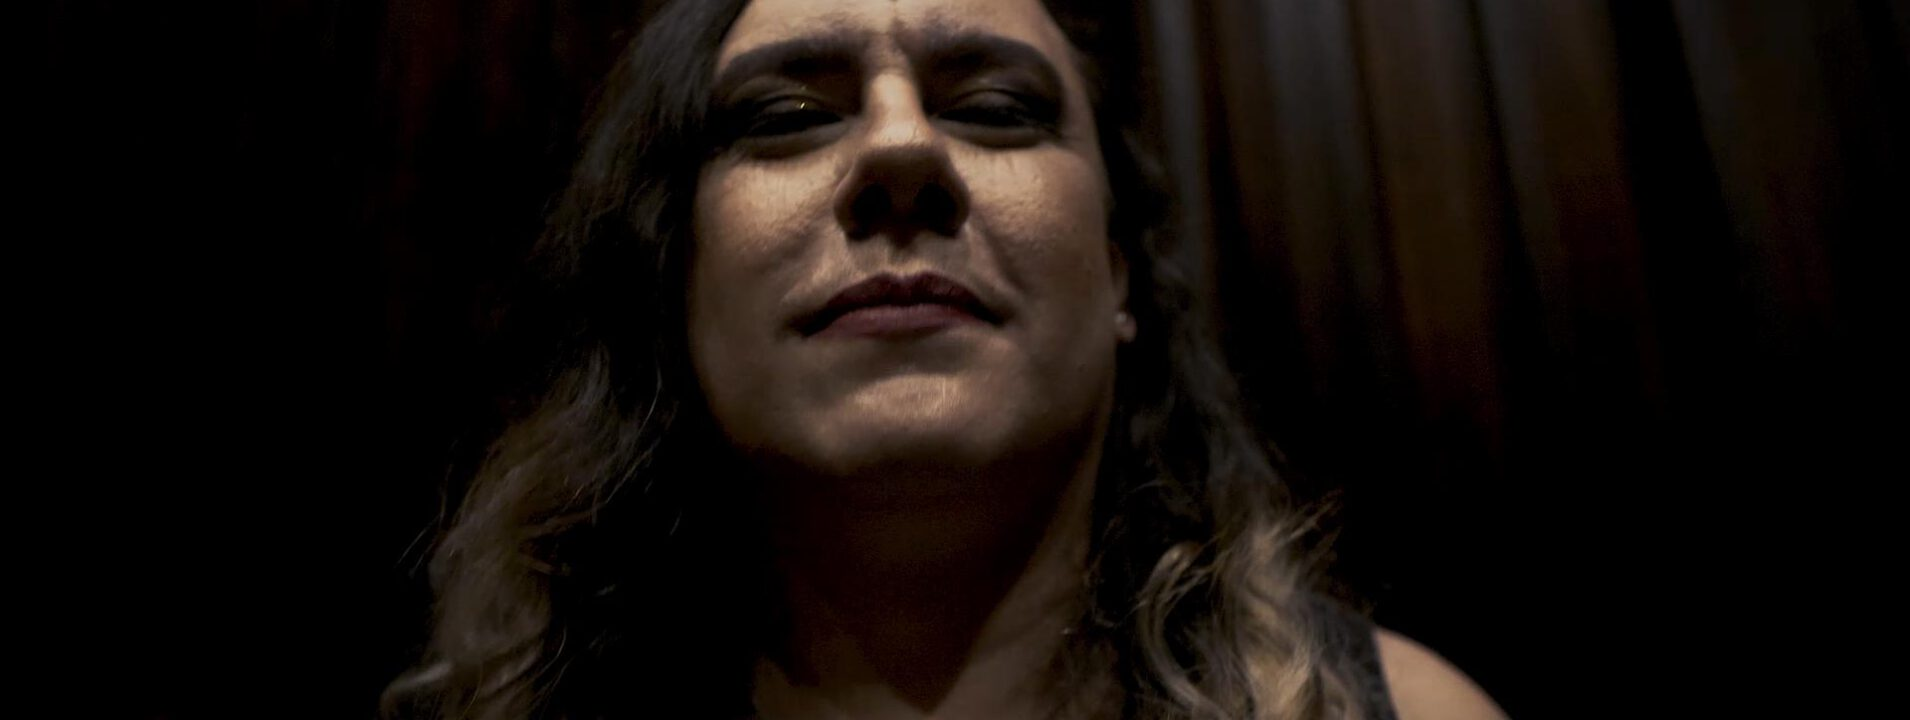 "Föxx Salema: Assista ao vídeo clipe de ""Rebel Hearts"""